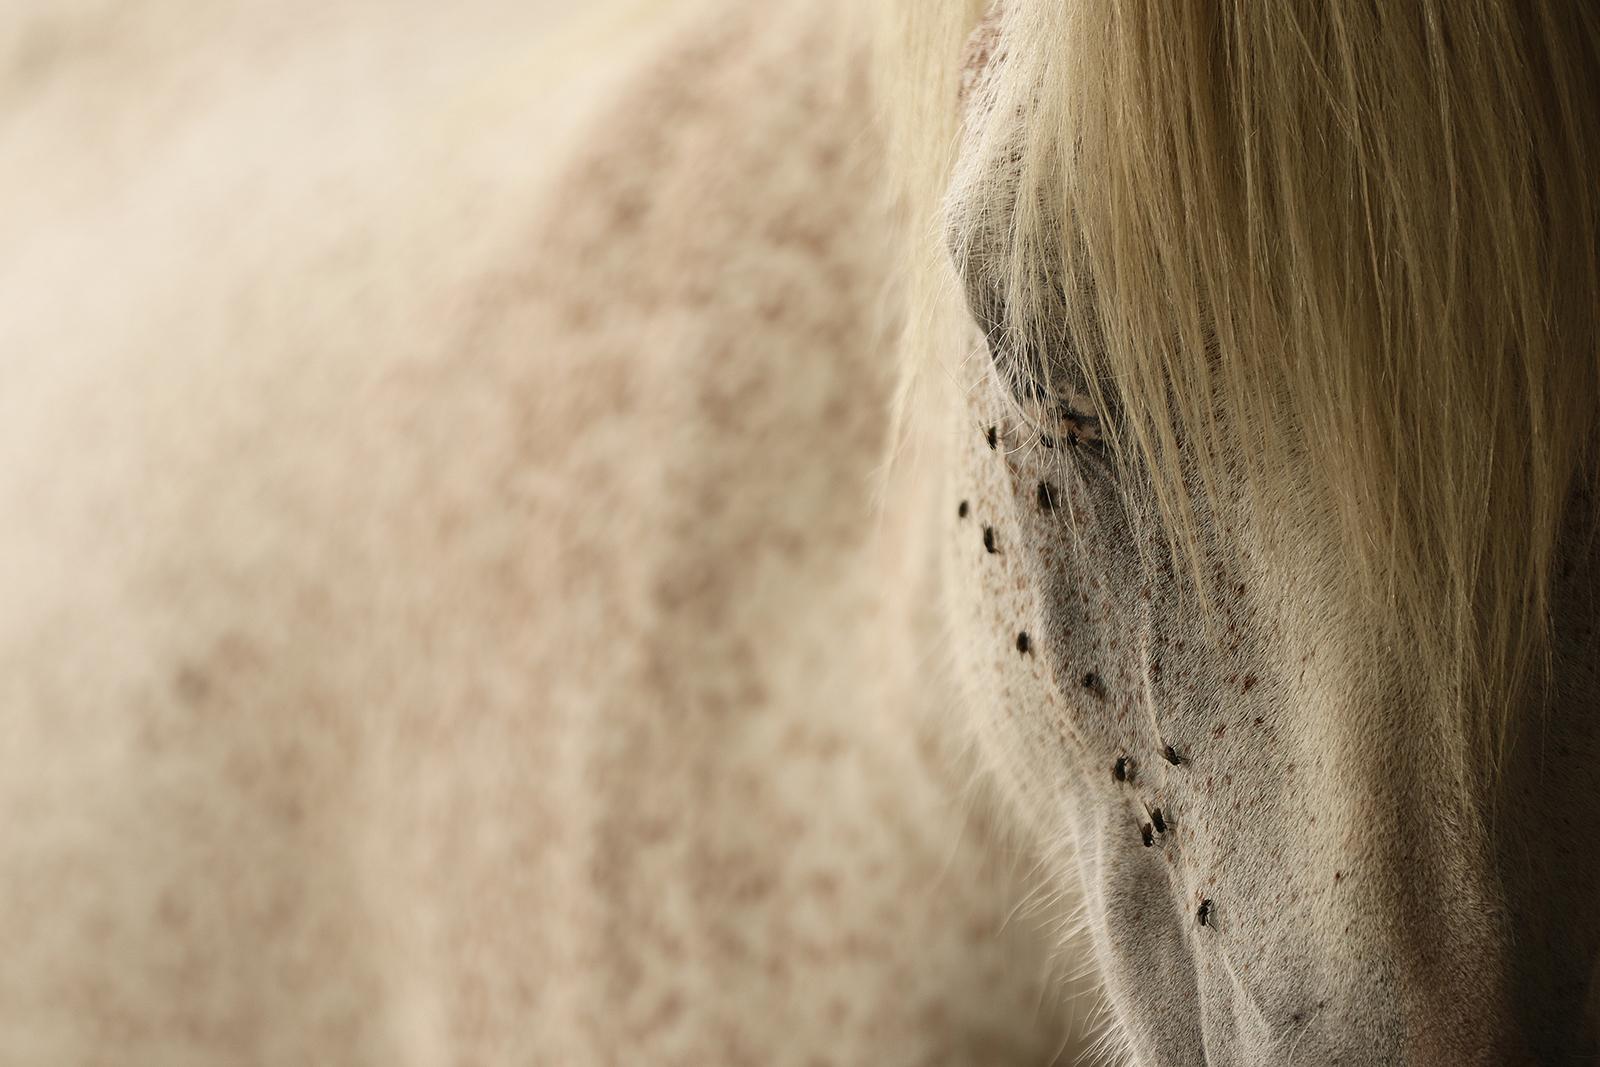 Third 'Horse 01' by Tony O'Reilly'